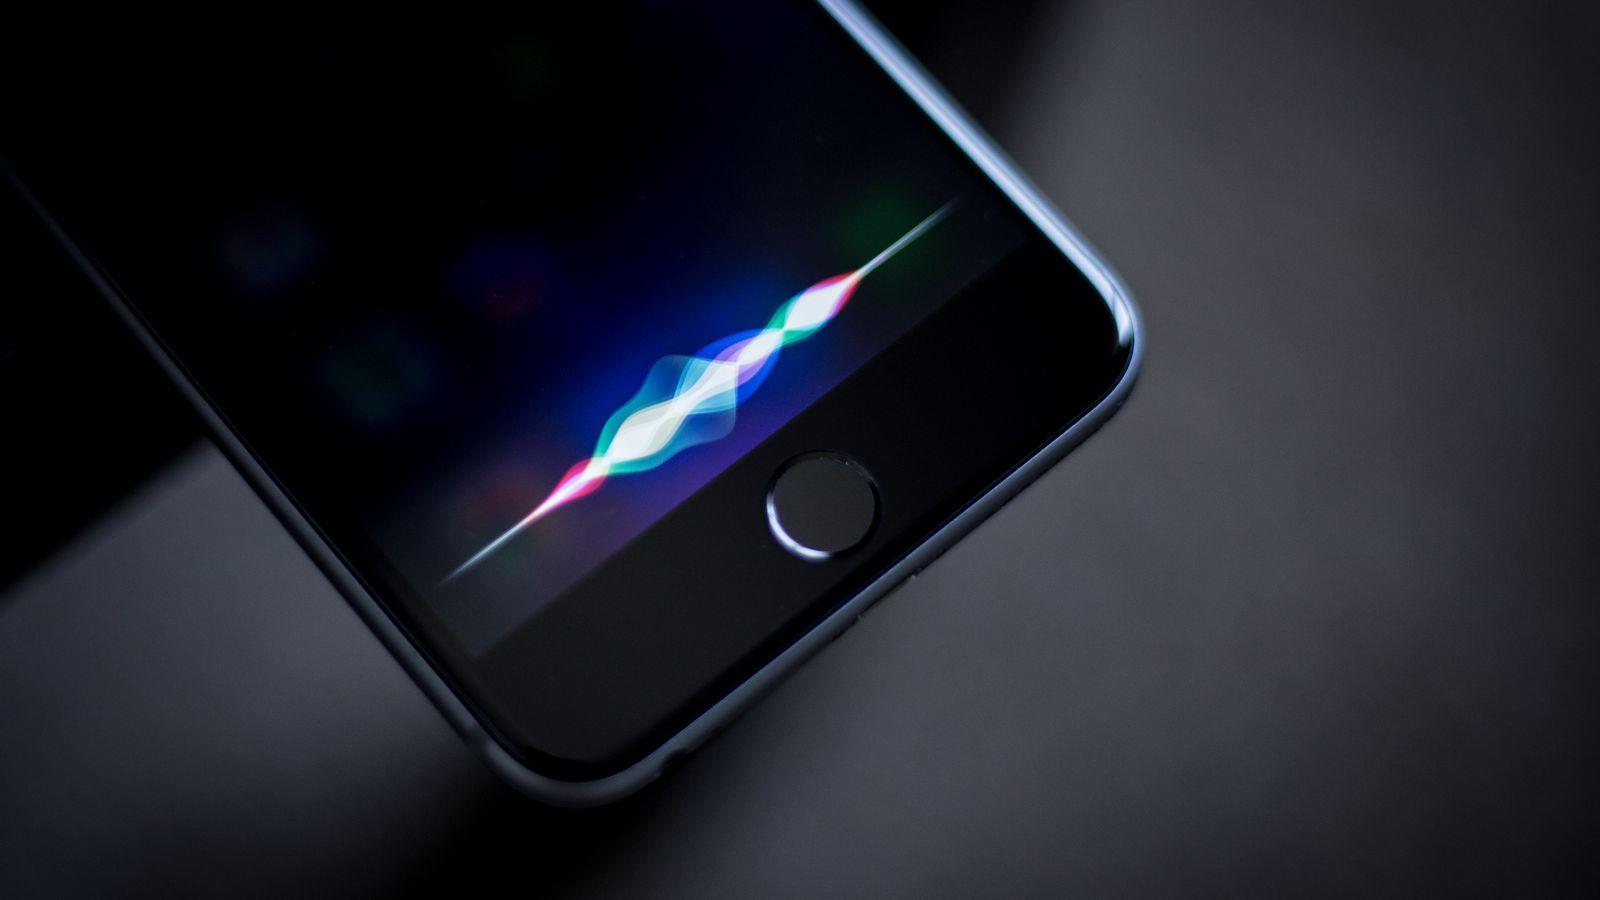 "iPhone 8 搭载了""苹果神经引擎"",你猜 Siri 会变得多聪明?  aso优化 第2张"